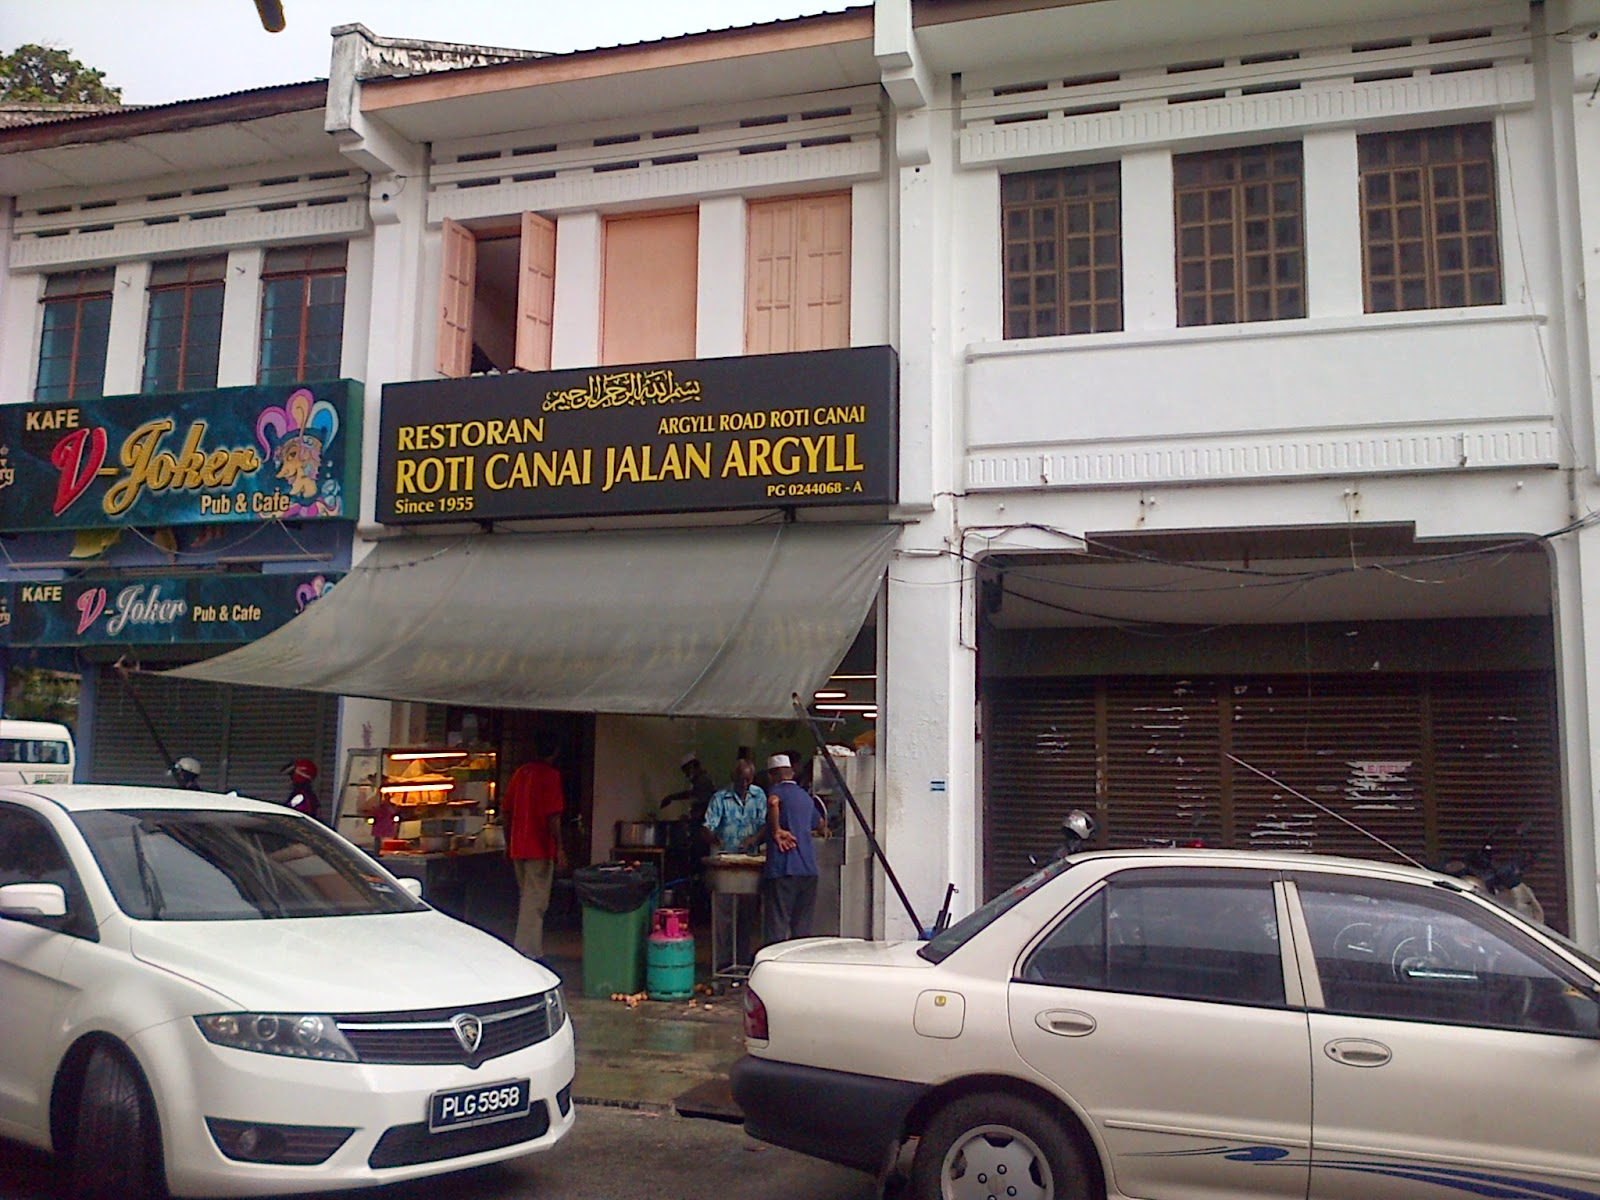 Argyll Road, Roti canai, Jalan-jalan cari makan, breakfast, Penang